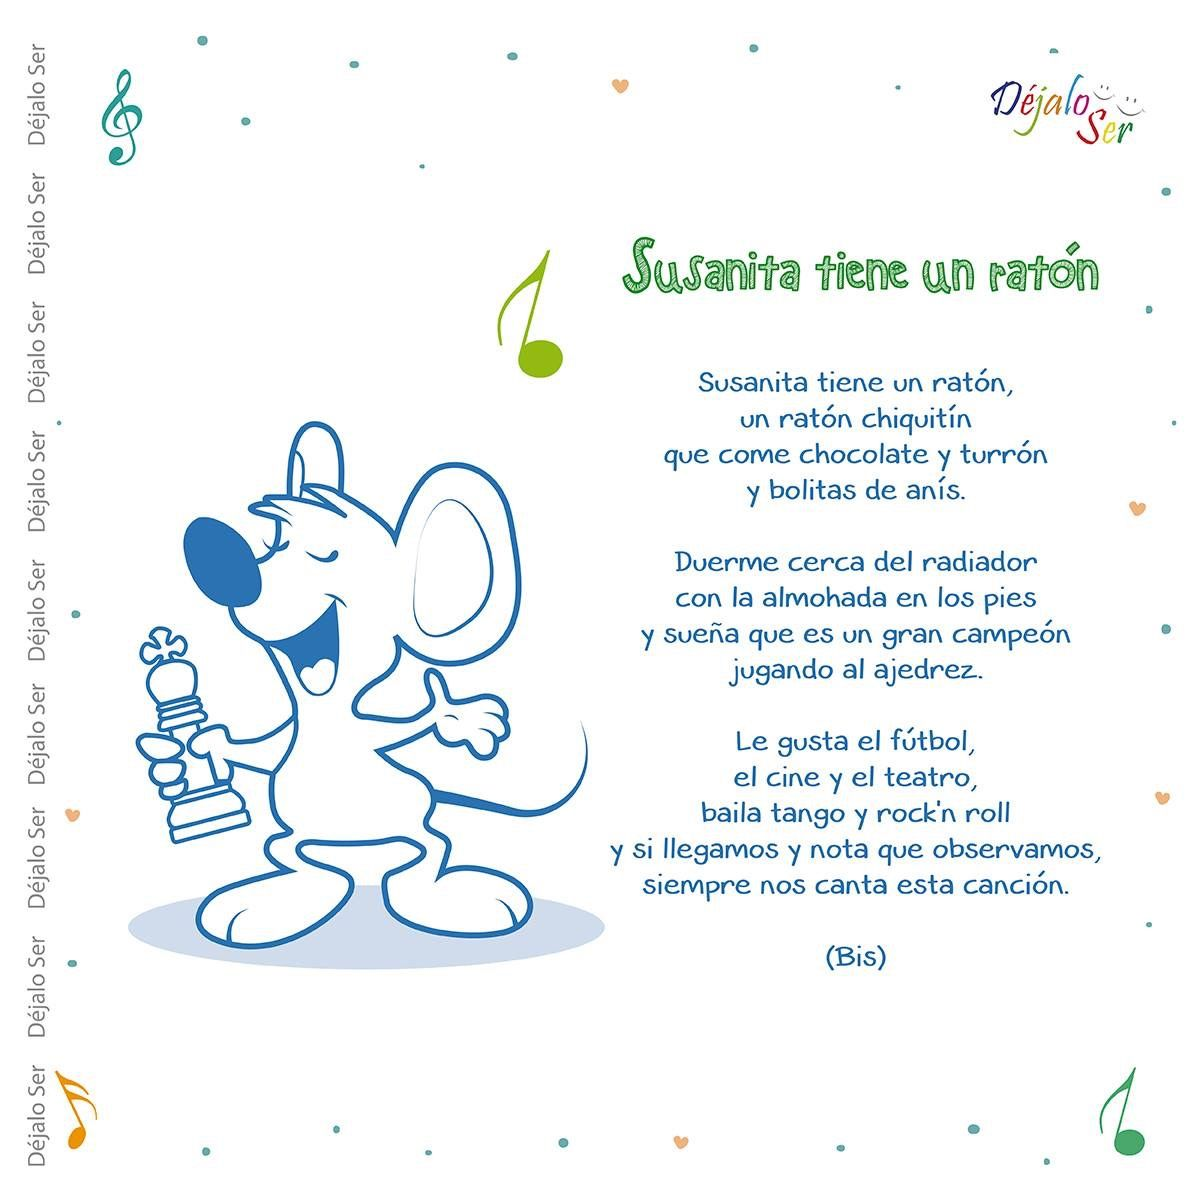 Cancion Infantil Para Ninos De 3 5 Anos Letras De Canciones Infantiles Canciones Preescolar Poemas Infantiles